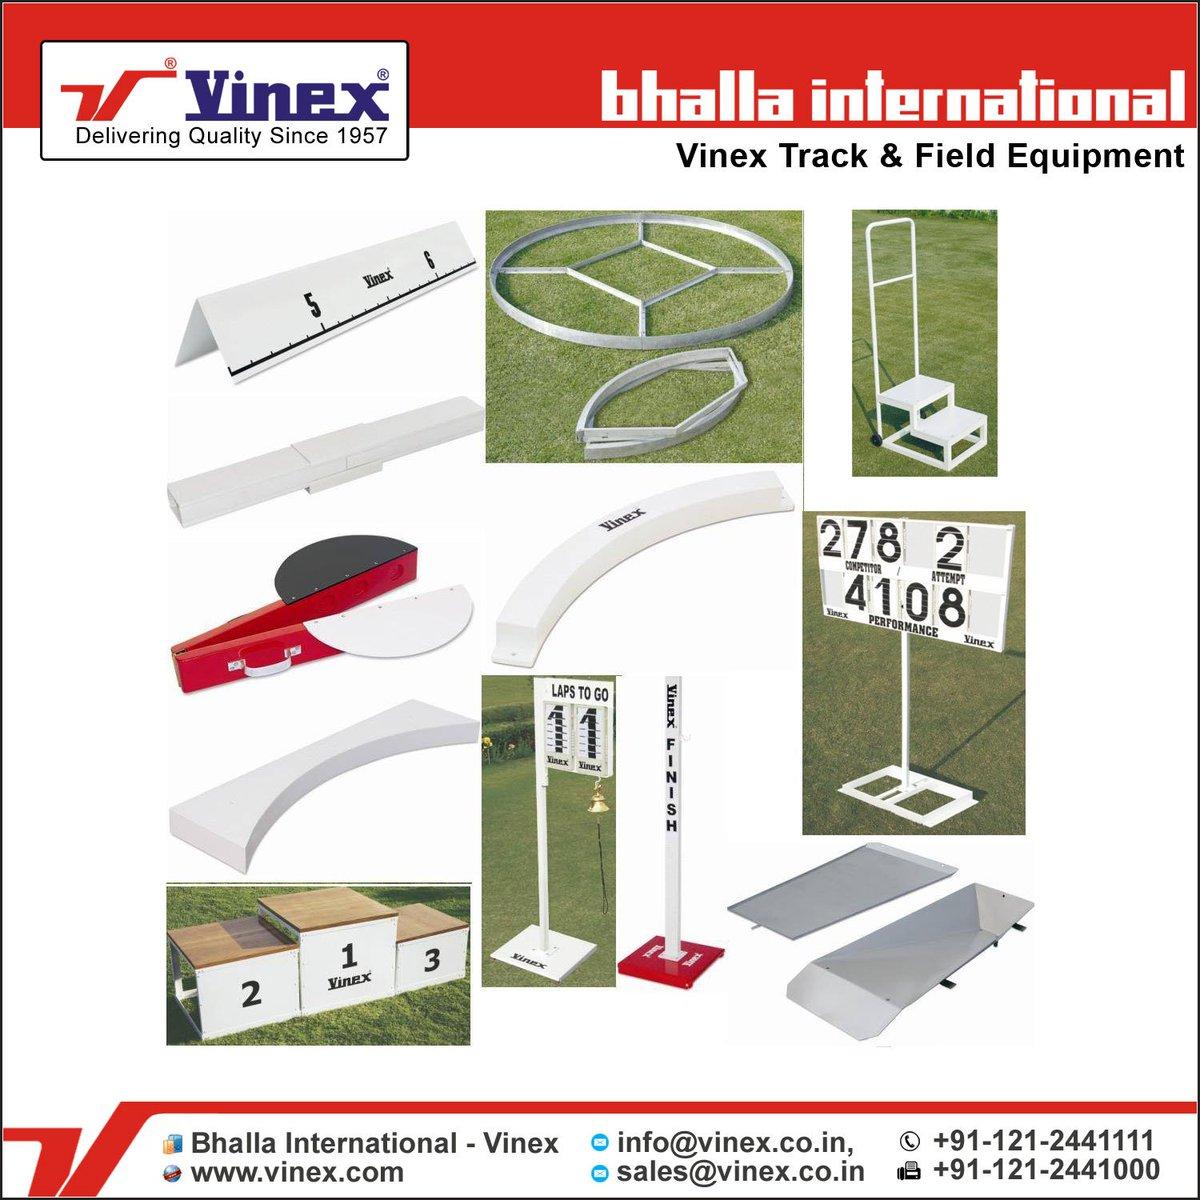 #BhallaInternational - #Vinex is one of the world&#39;s oldest #Track &amp; #Field Equipment #Manufacturer &amp; #Supplier. @  http://www. vinex.com  &nbsp;  <br>http://pic.twitter.com/QGfO5oeMwF